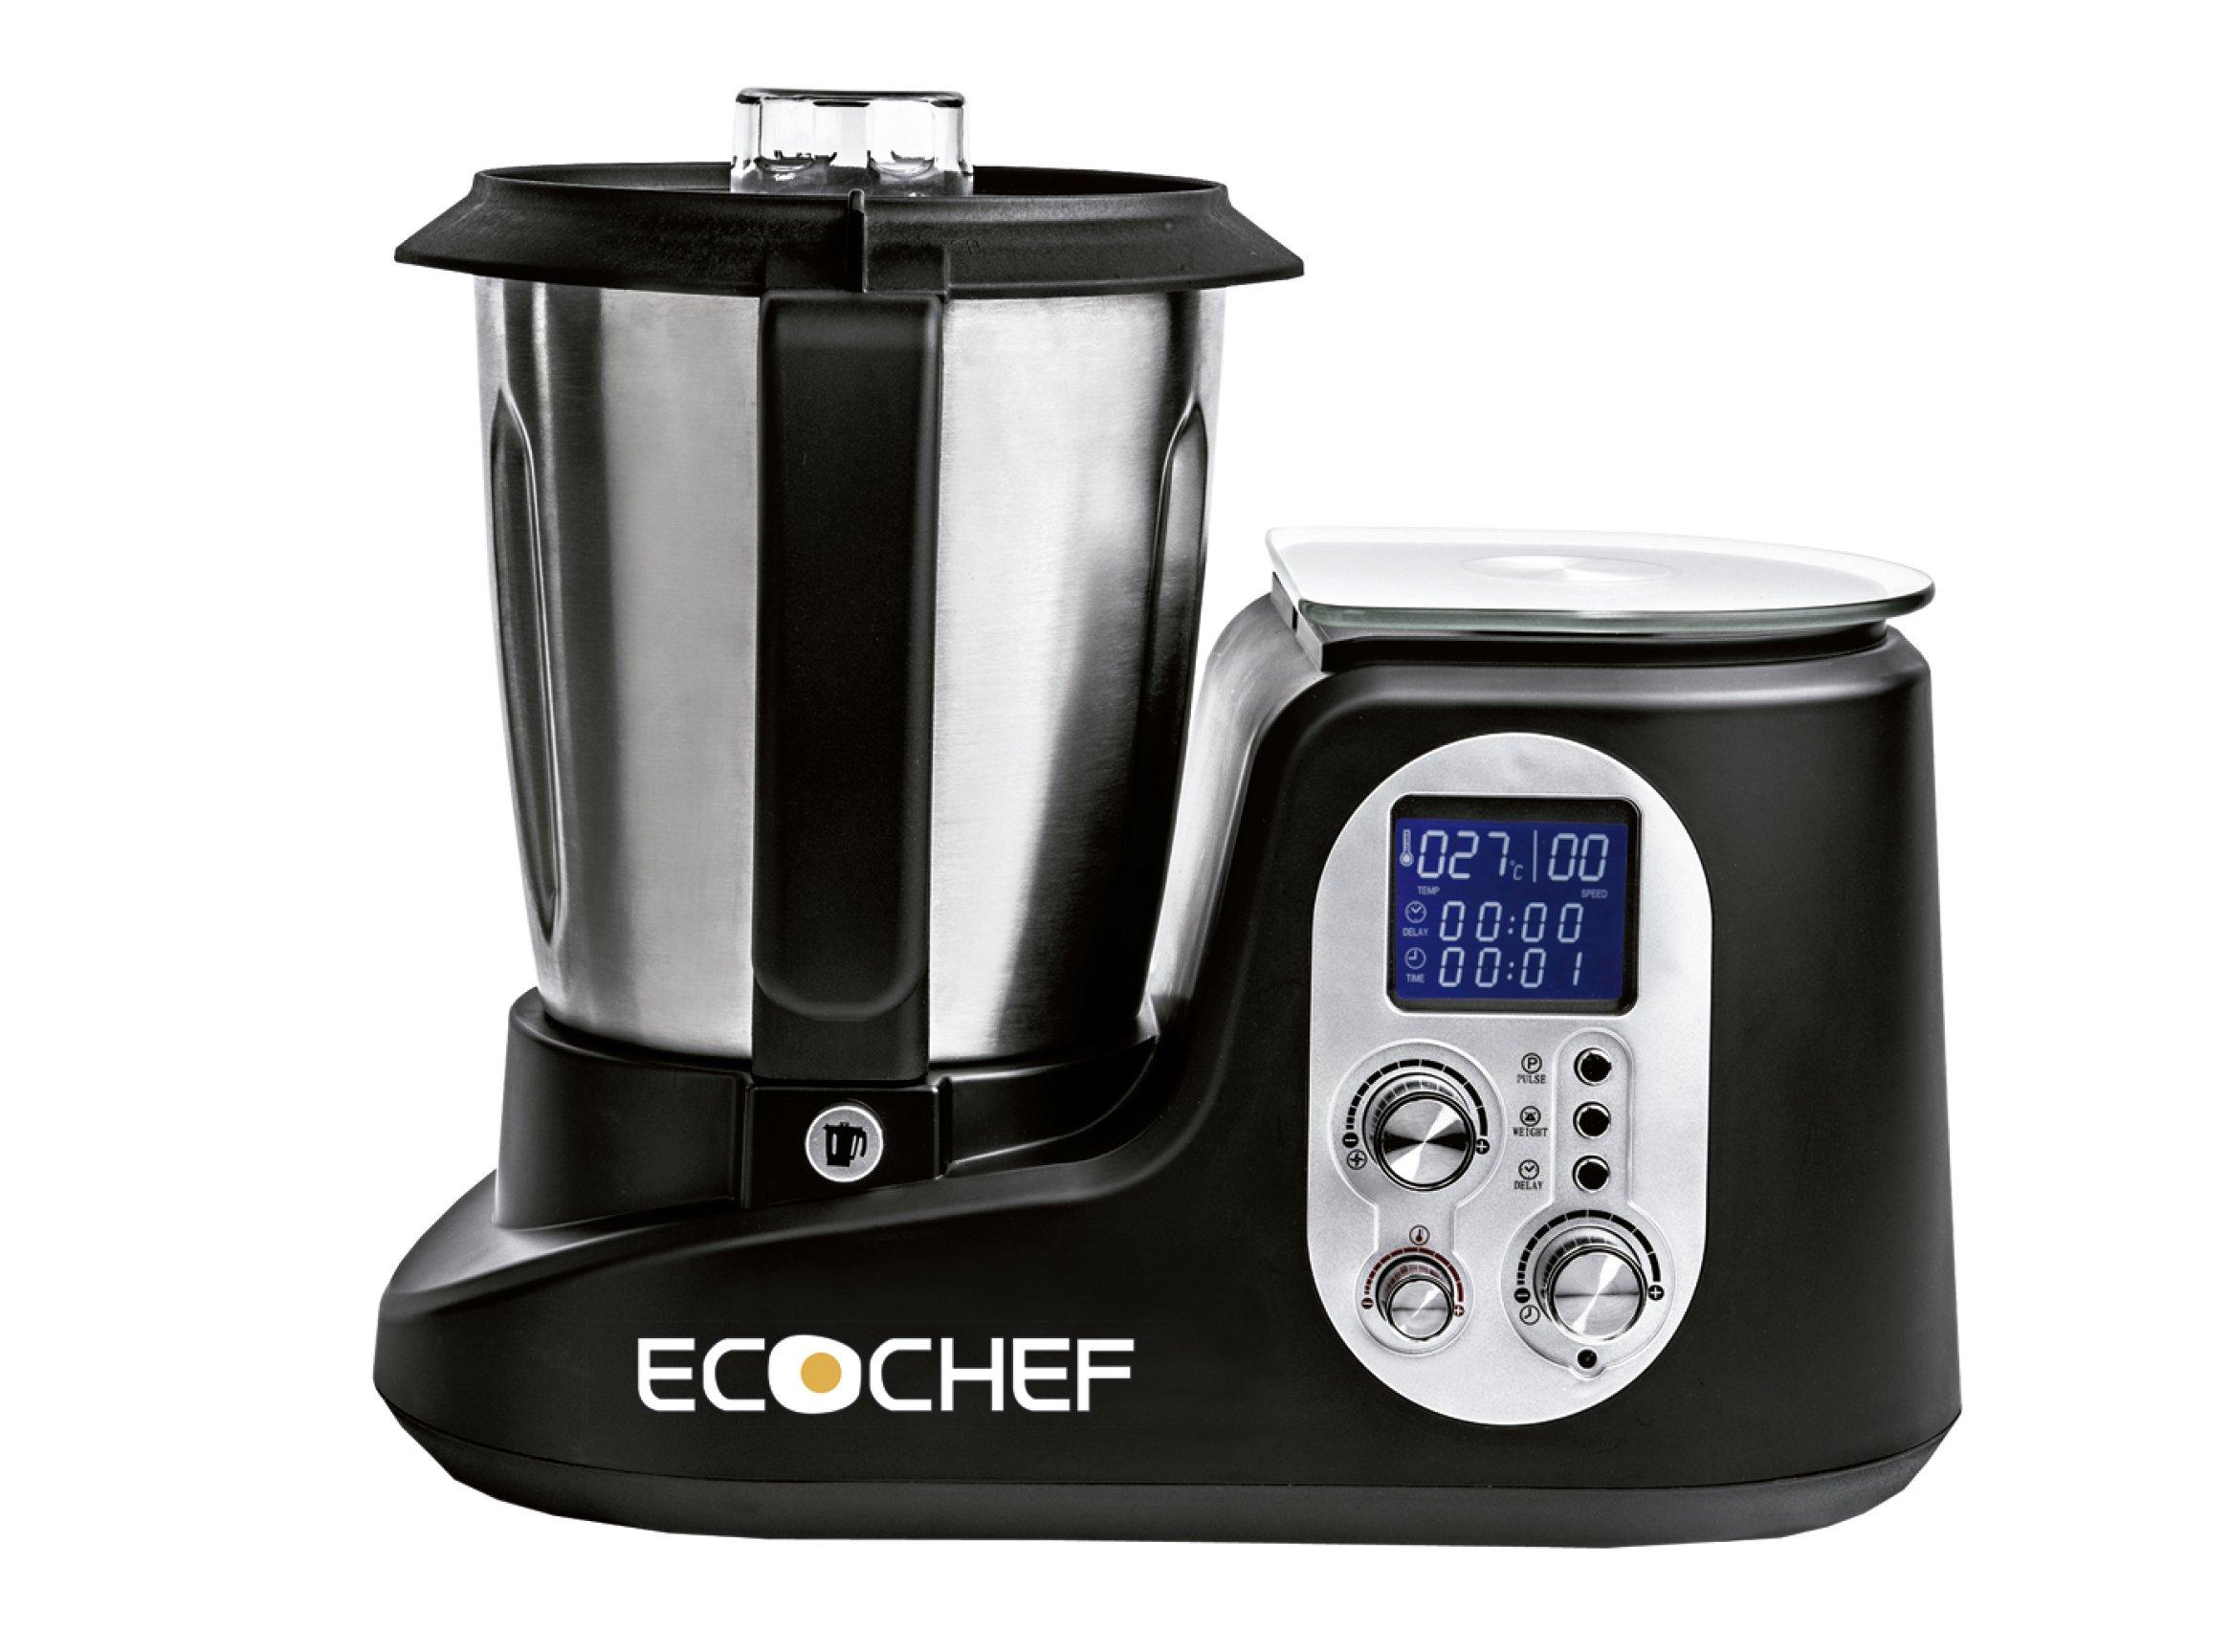 Erika Ecochef Mix Robot de cocina, 1000 W, Acero Inoxidable, Negro: Amazon.es: Hogar